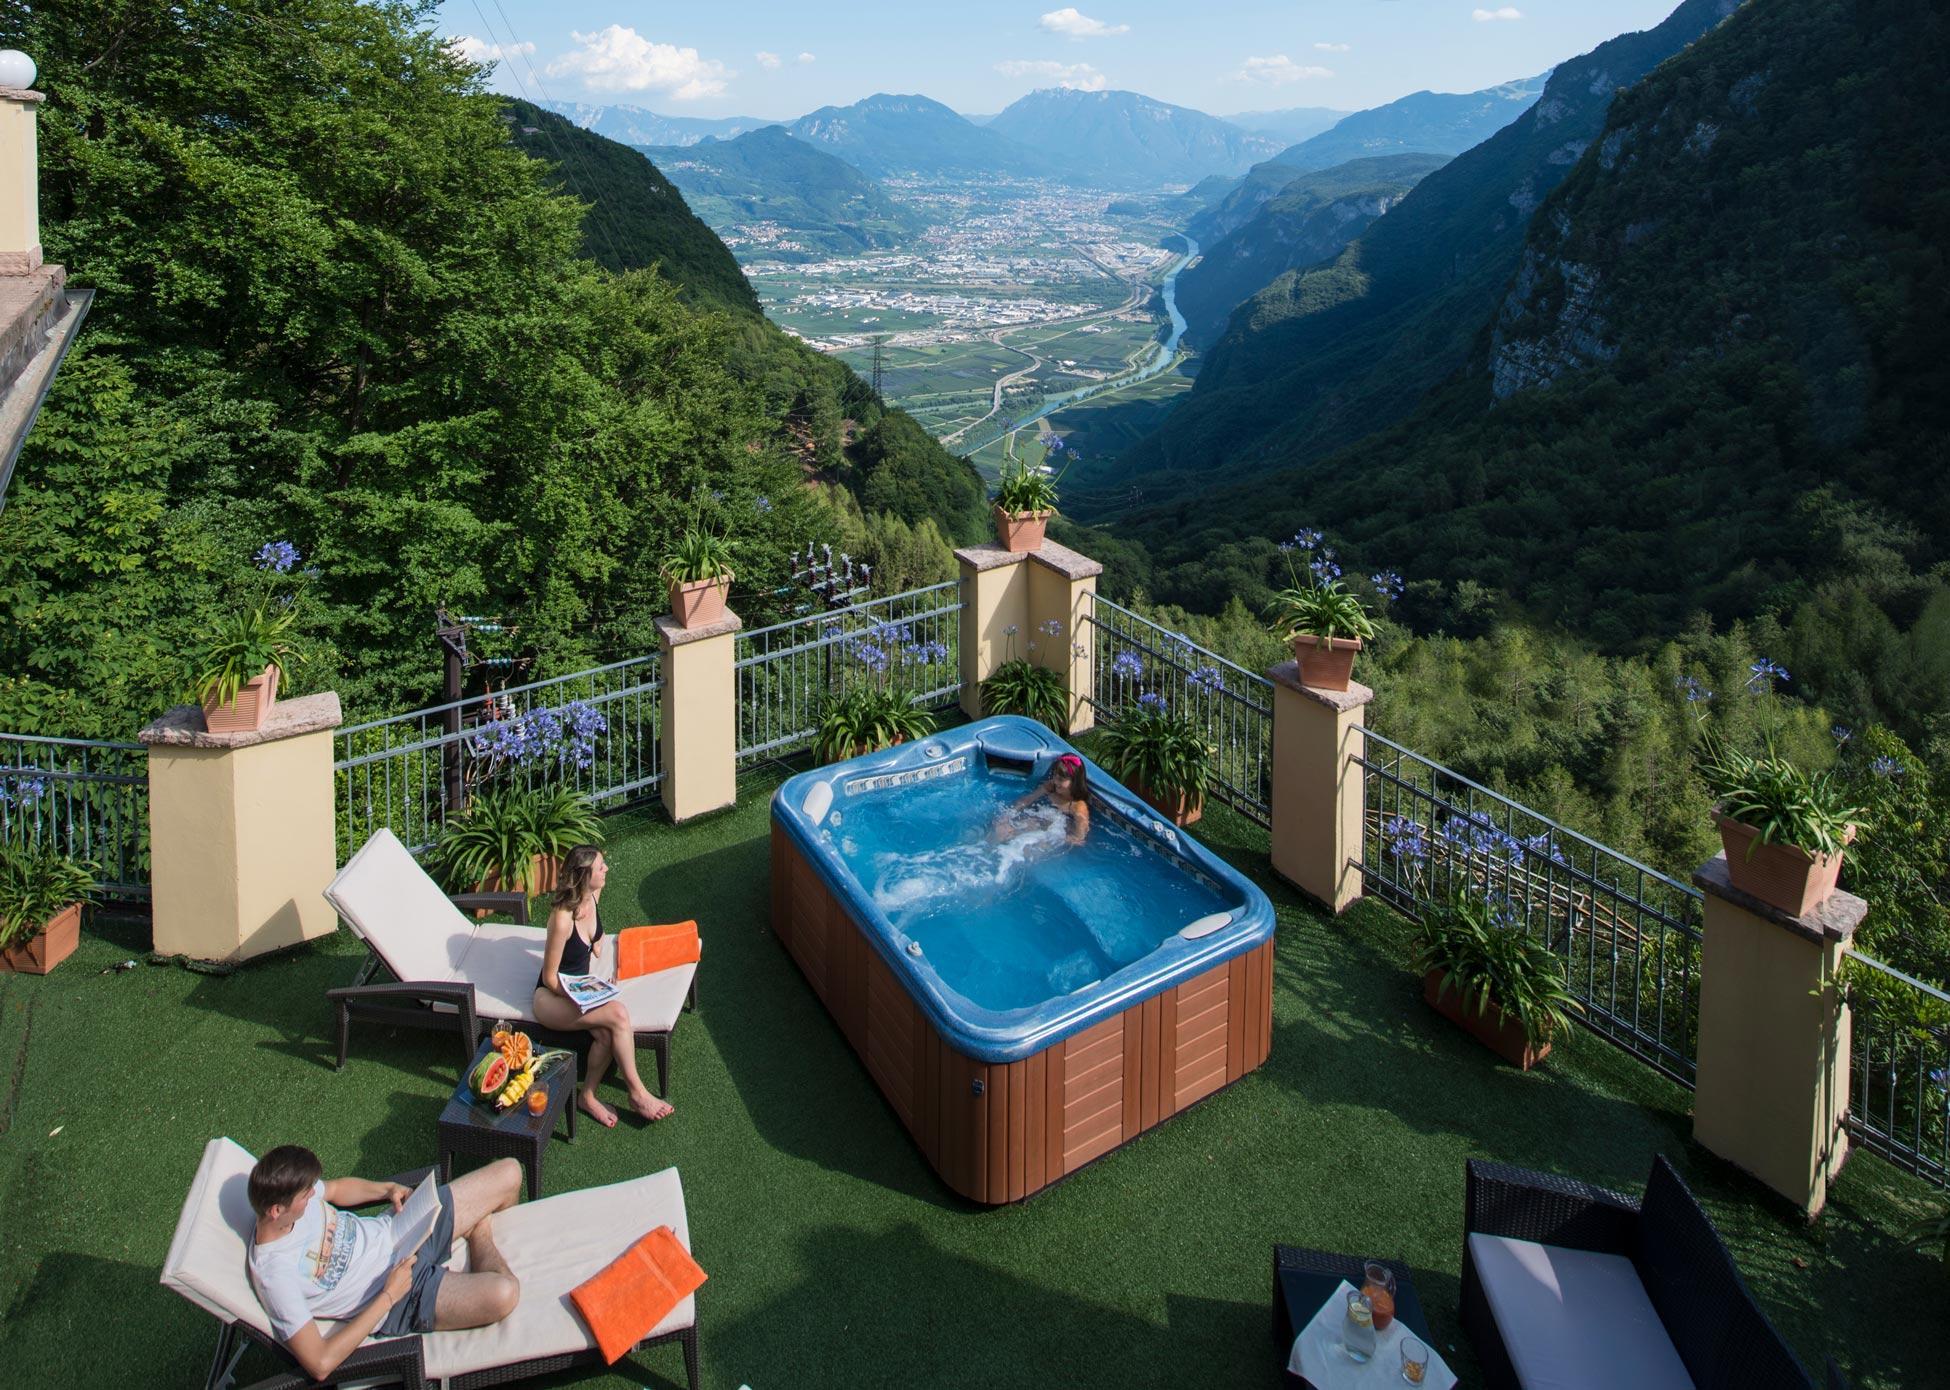 Hotel_miravalle_Albergo08